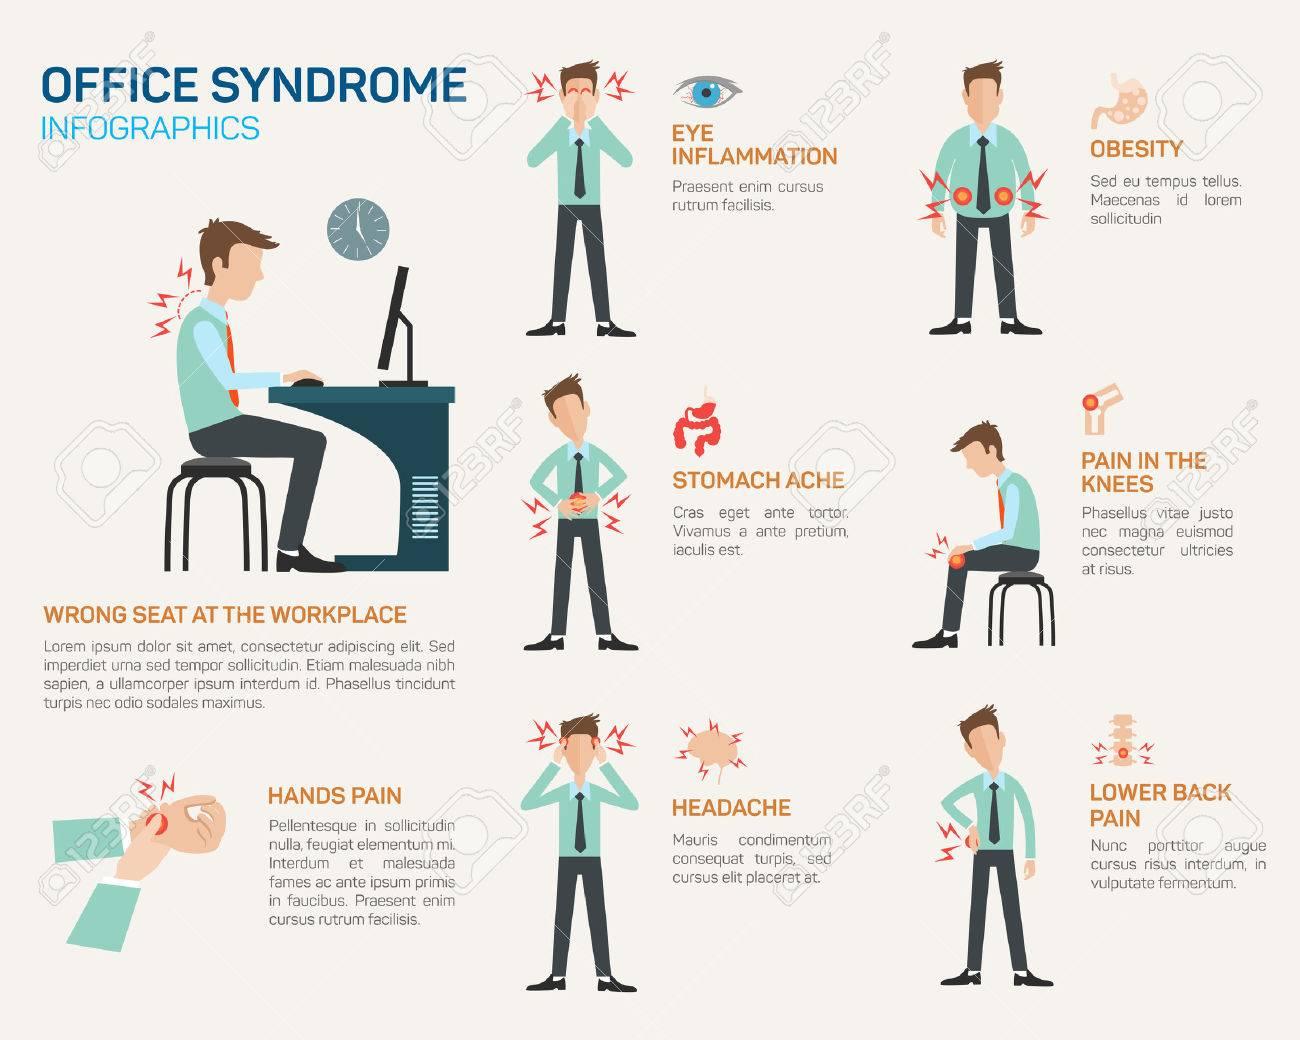 Vector Flache Abbildung Für Büro-Syndrom. Falsches Sitzen Am ...